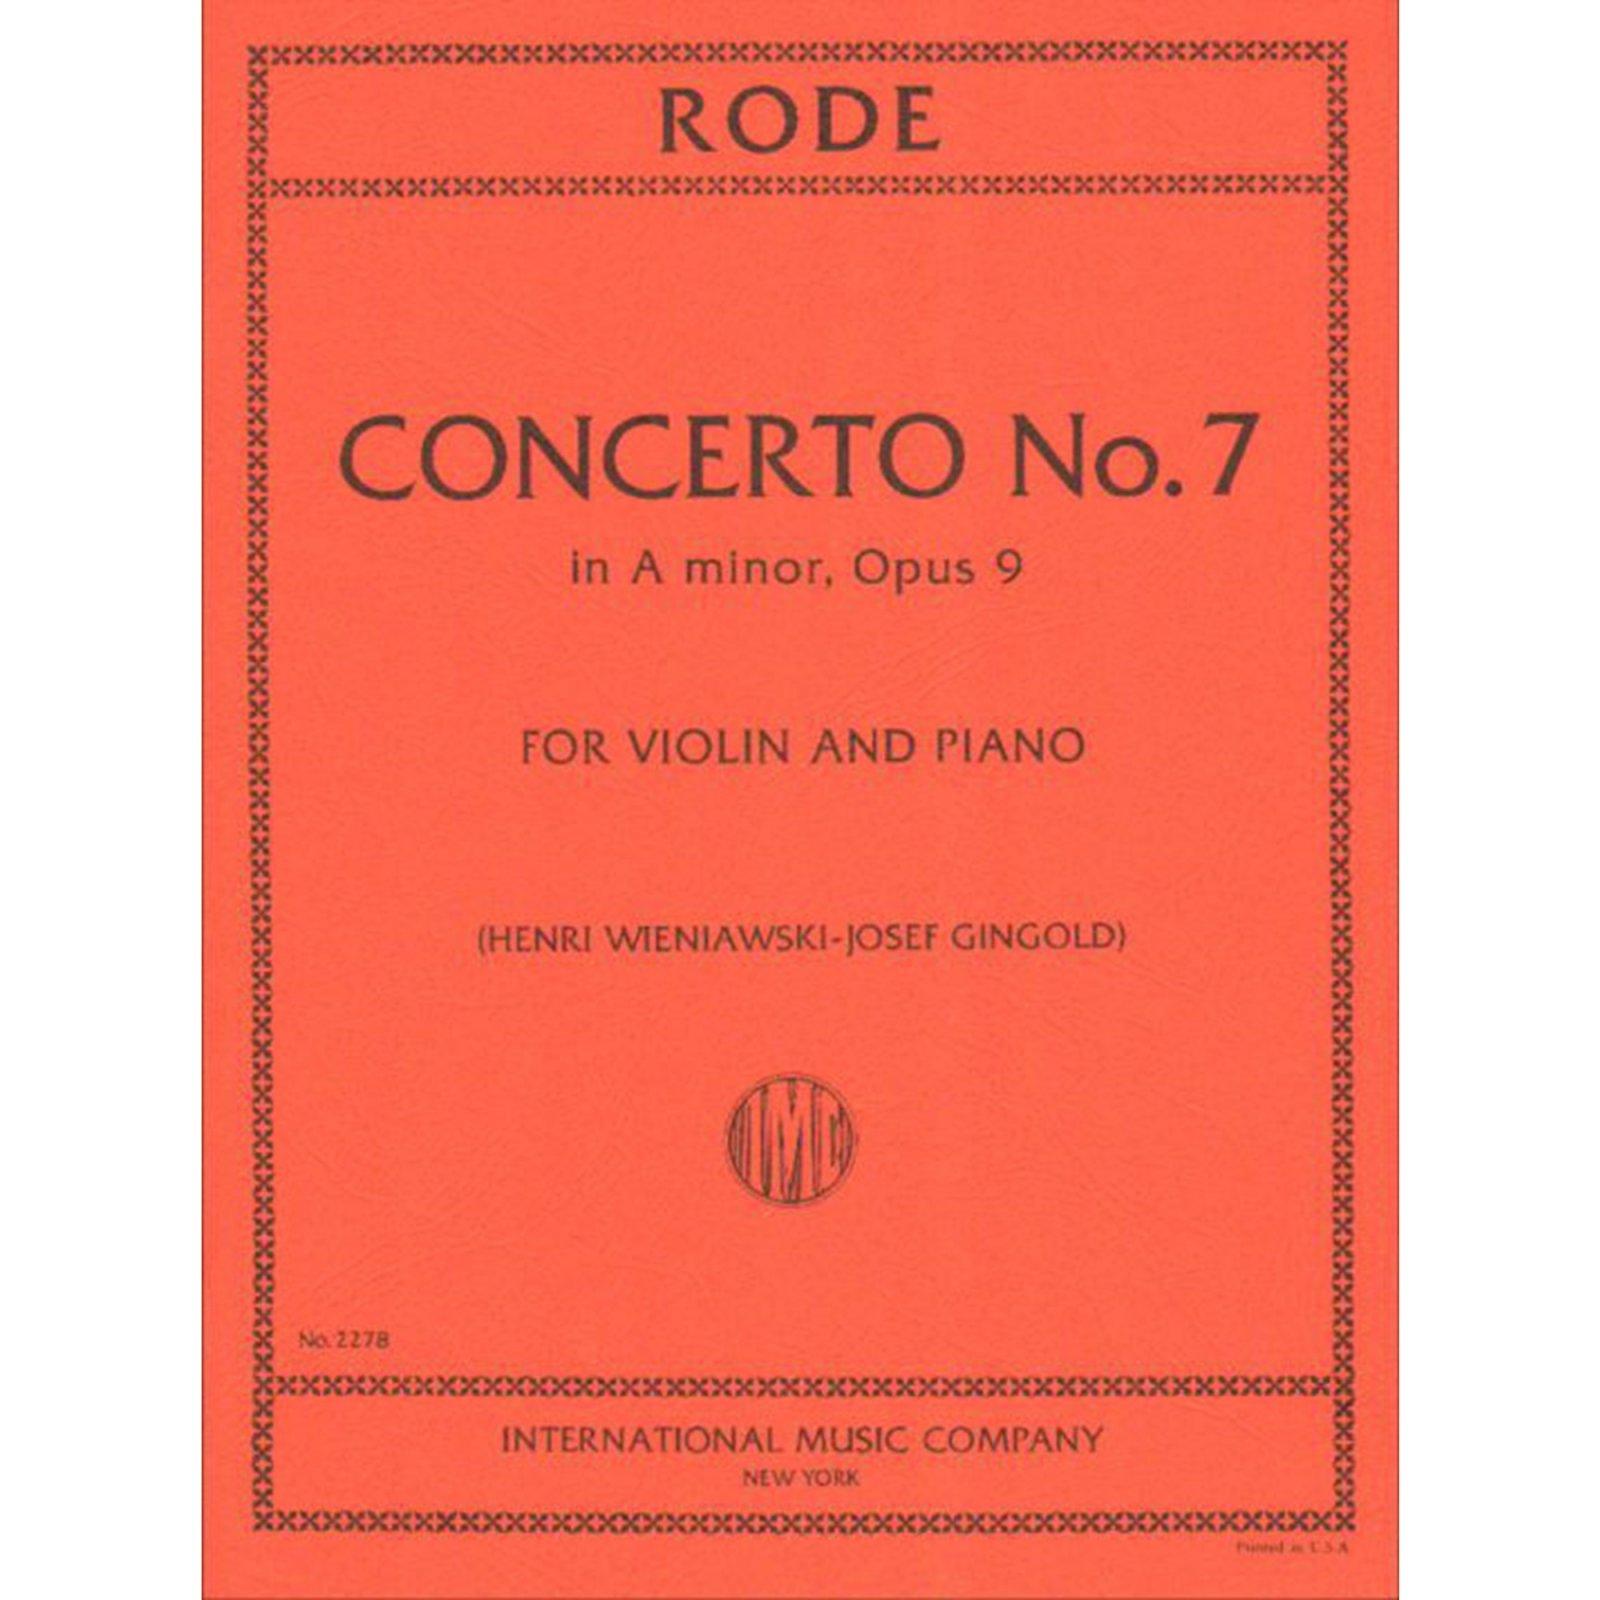 Rode: Concerto No.7 In A minor Op. 9